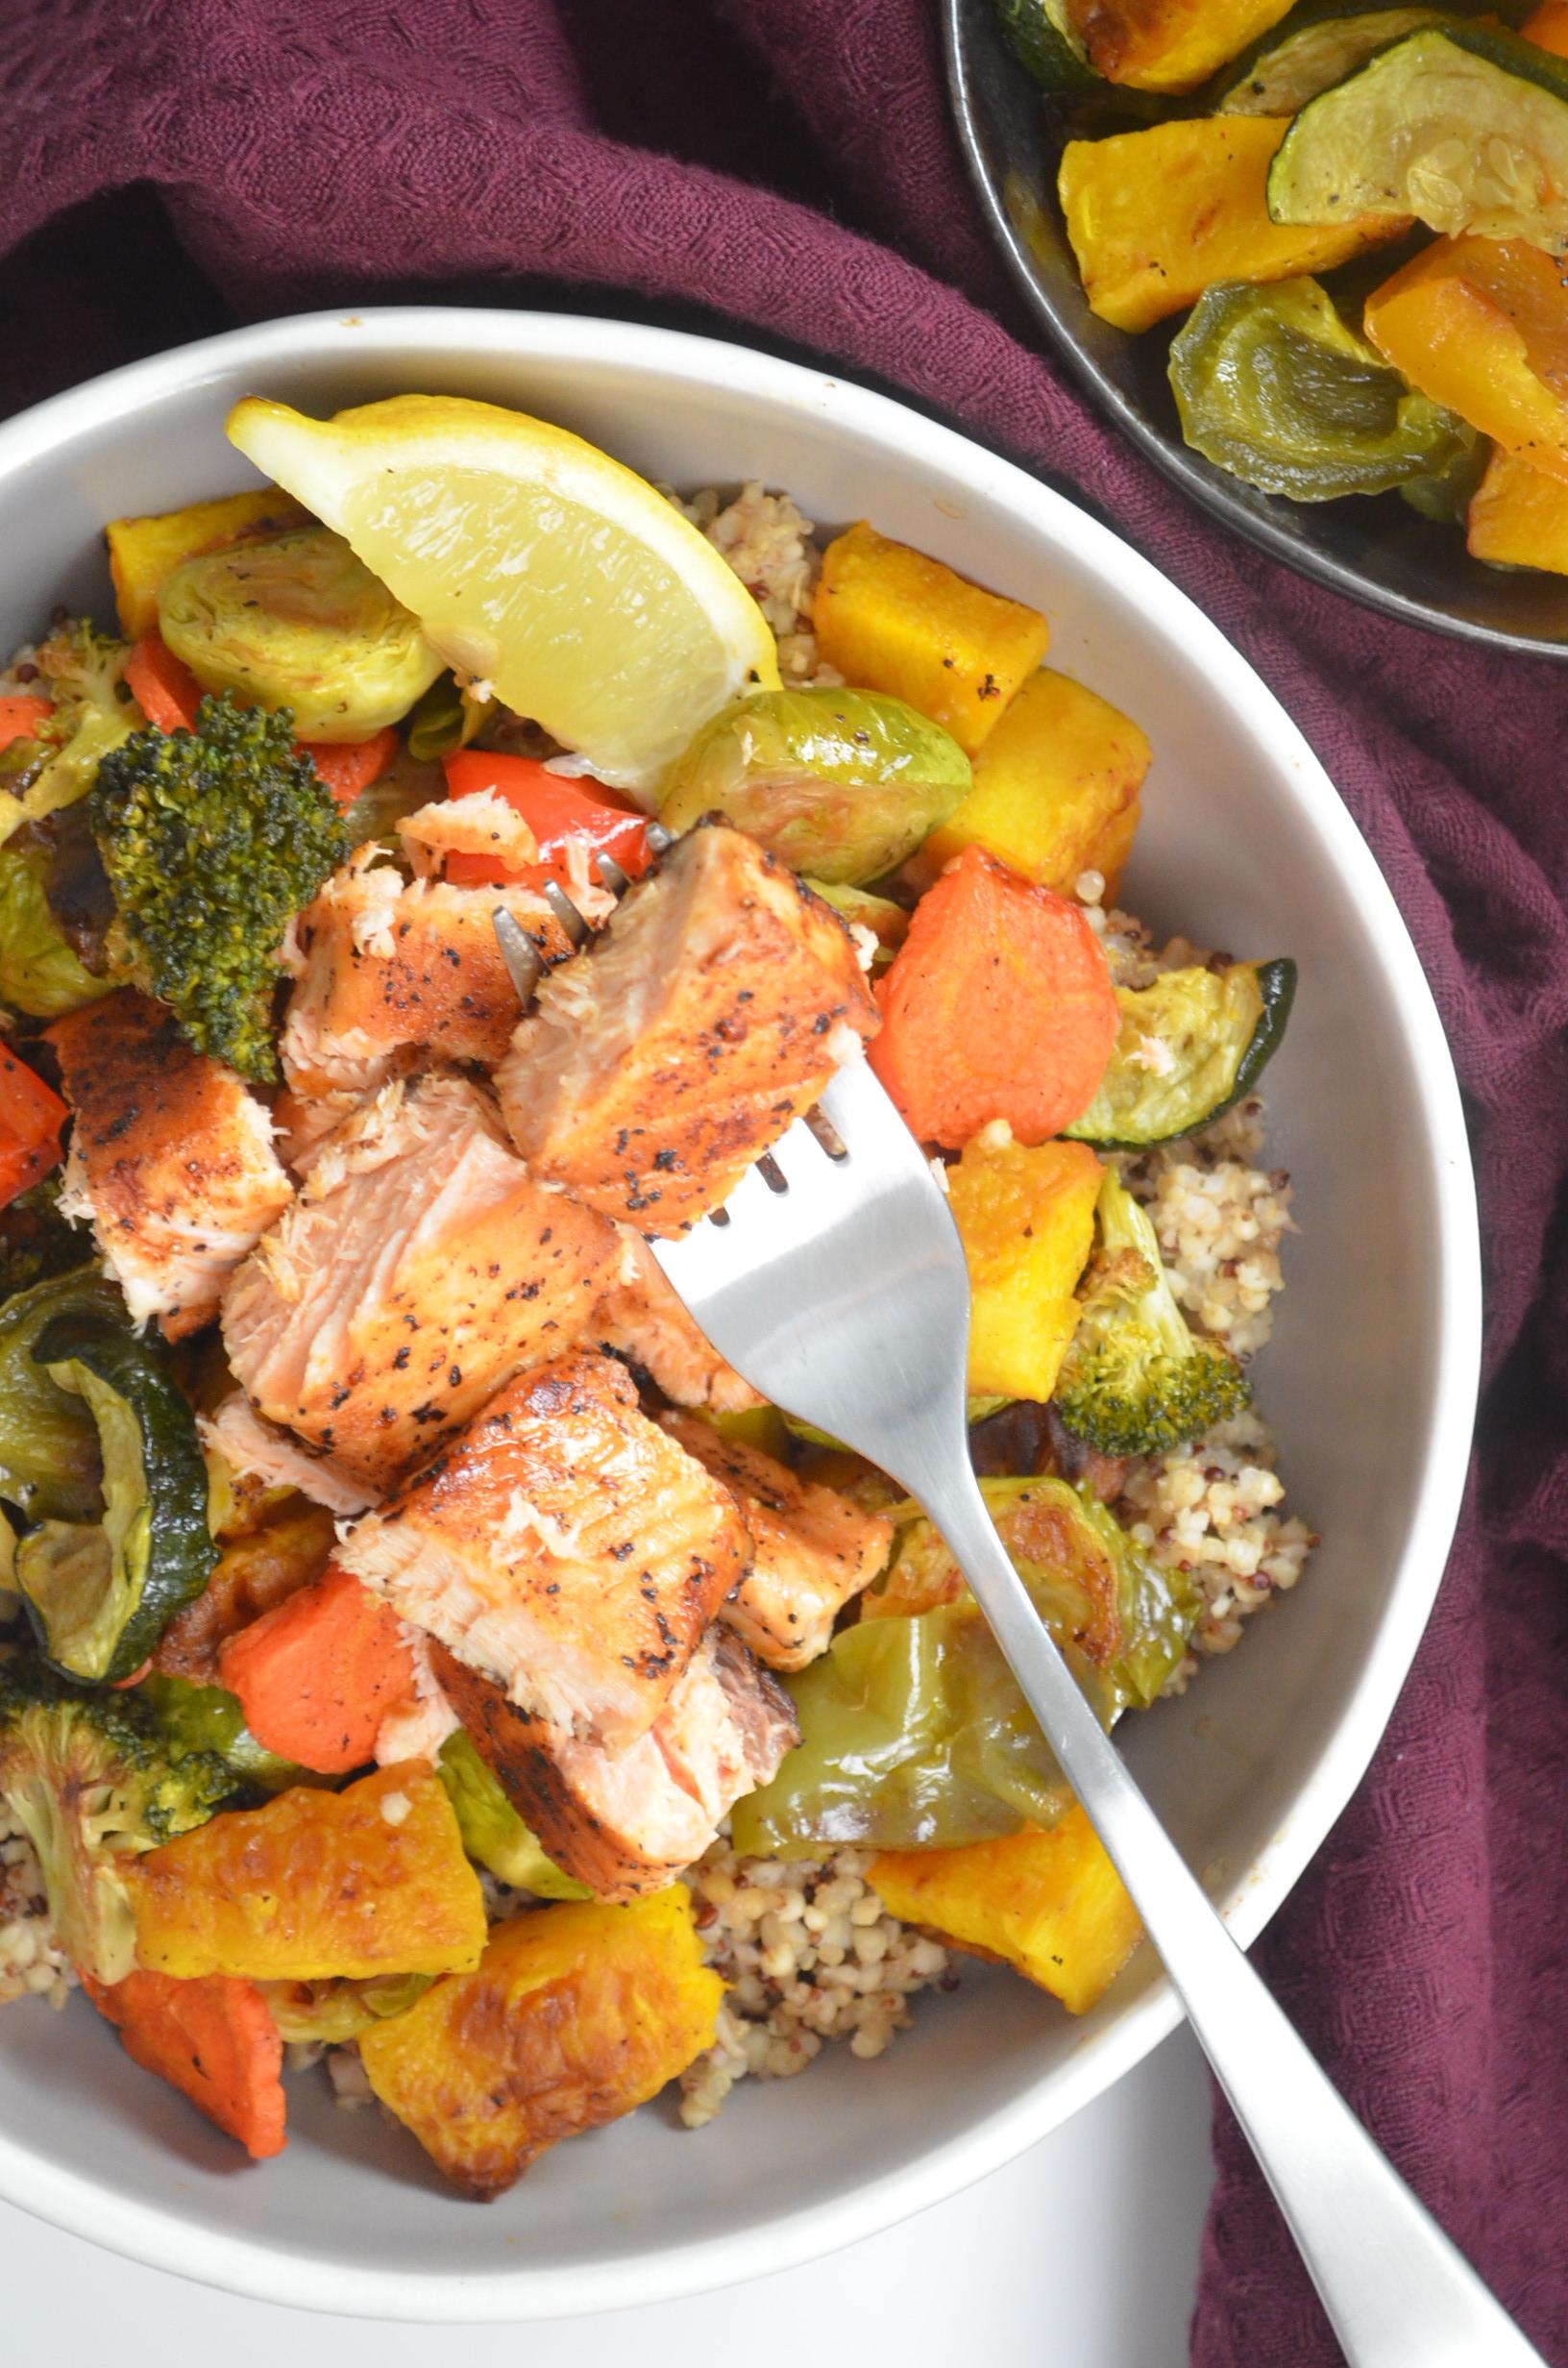 Salmon and Roasted Veggie Bowl